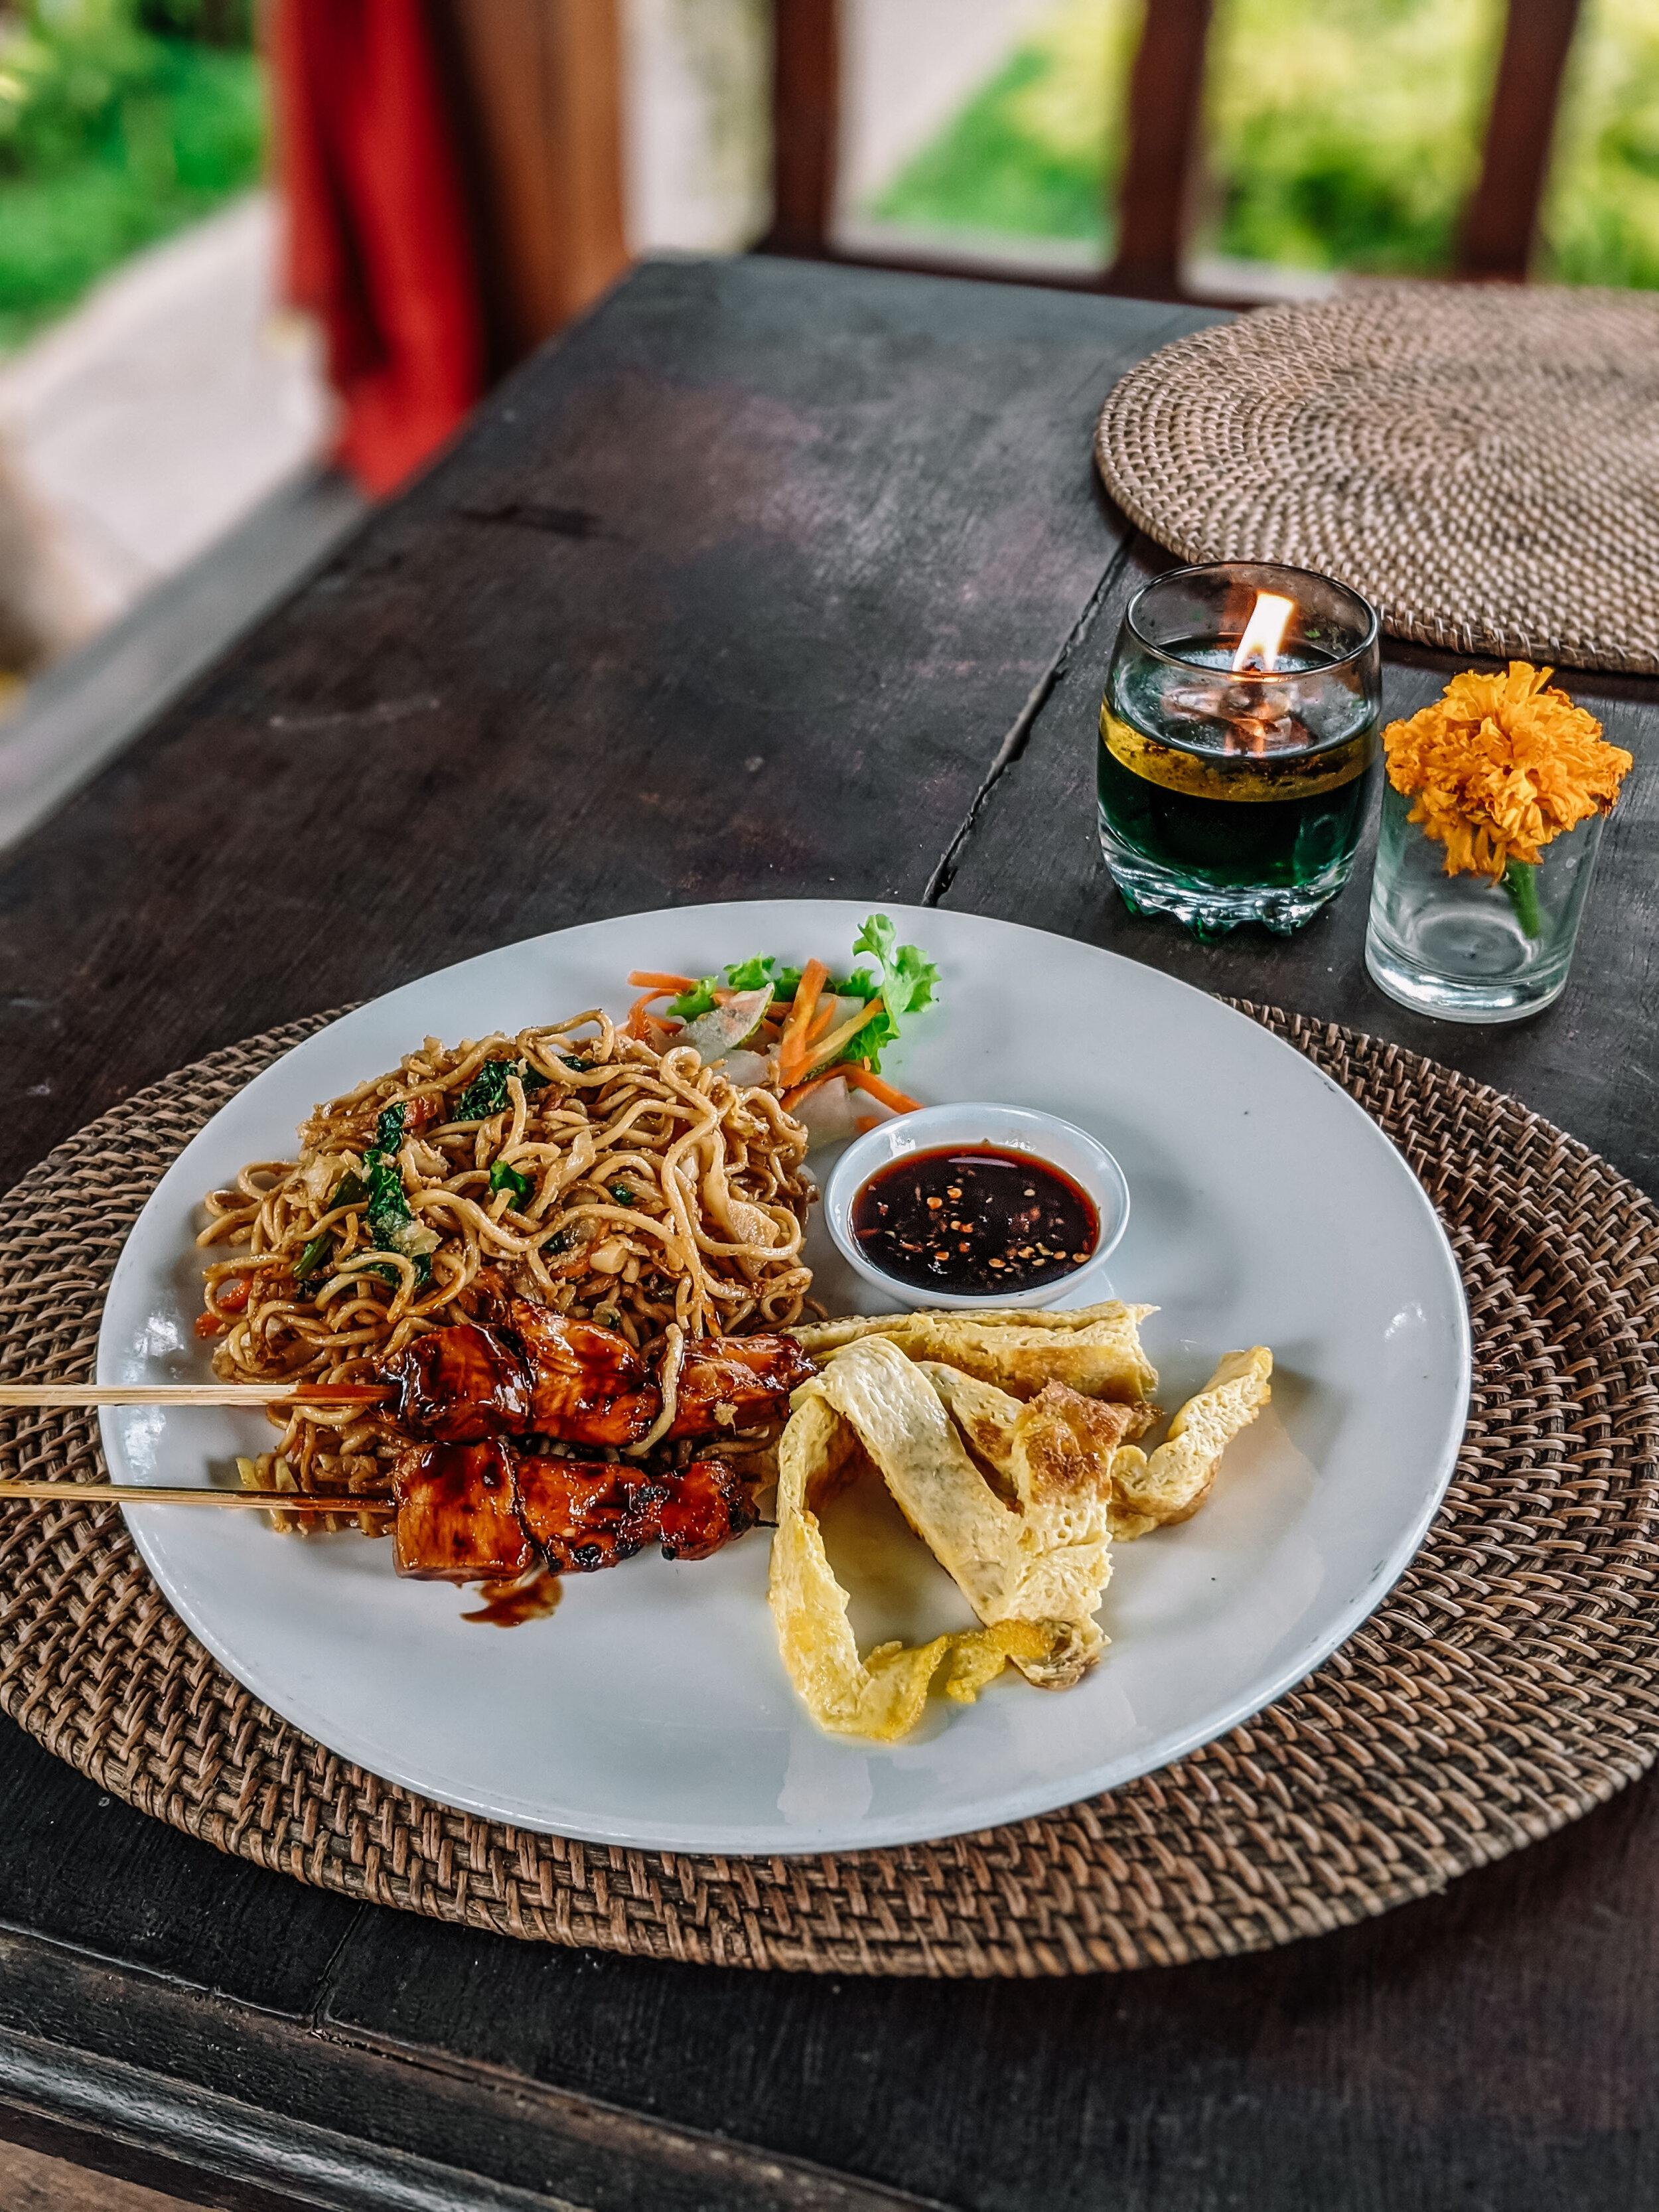 Rachel Off Duty: Dining Out in Bali